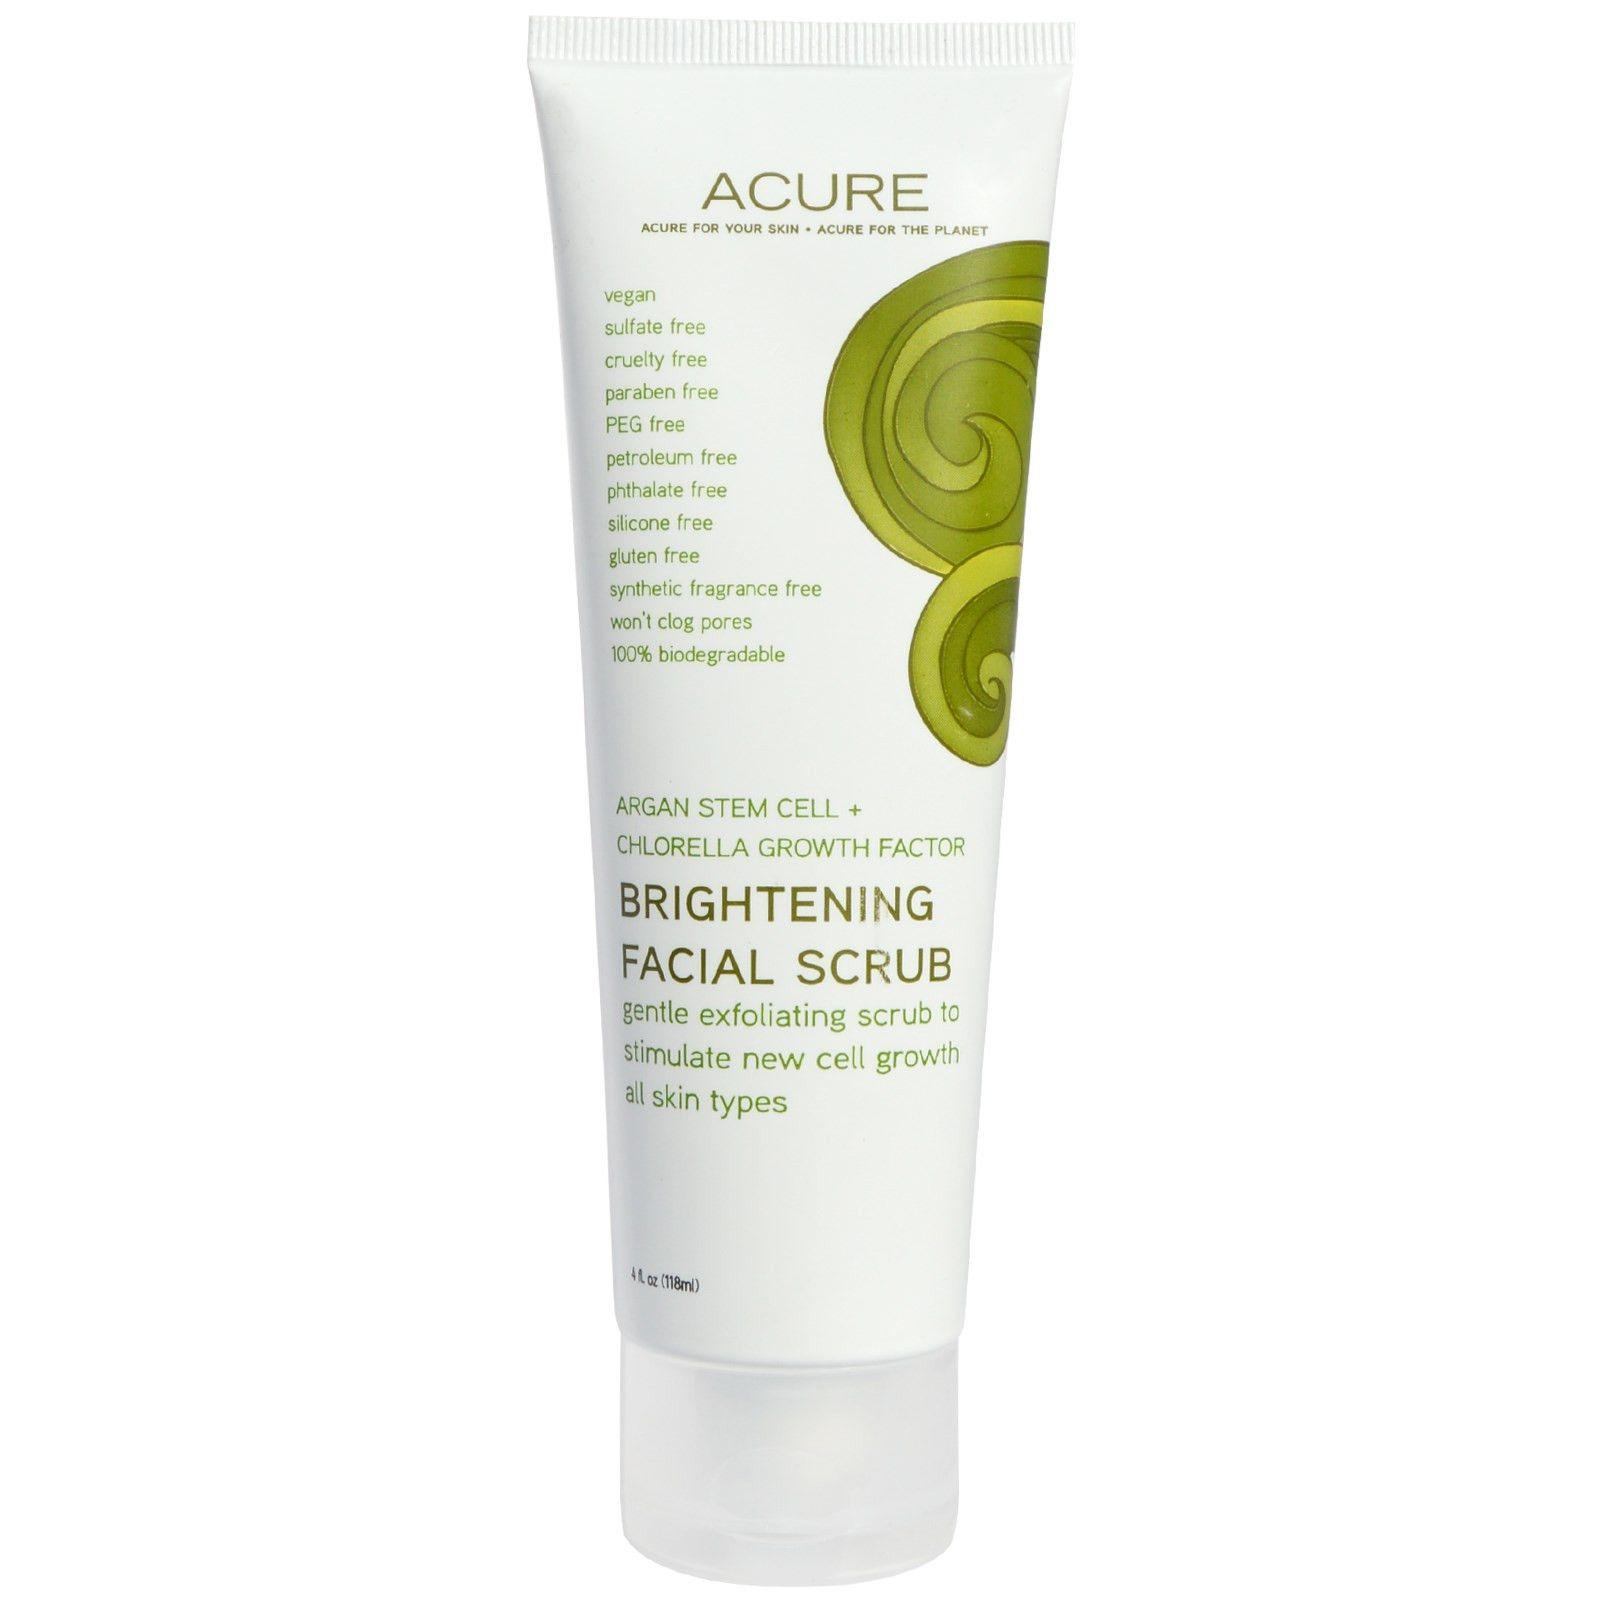 Acure Brilliantly Brightening Facial Scrub With Sea Kelp: ACURE Brilliantly Brightening Facial Scrub With Sea Kelp